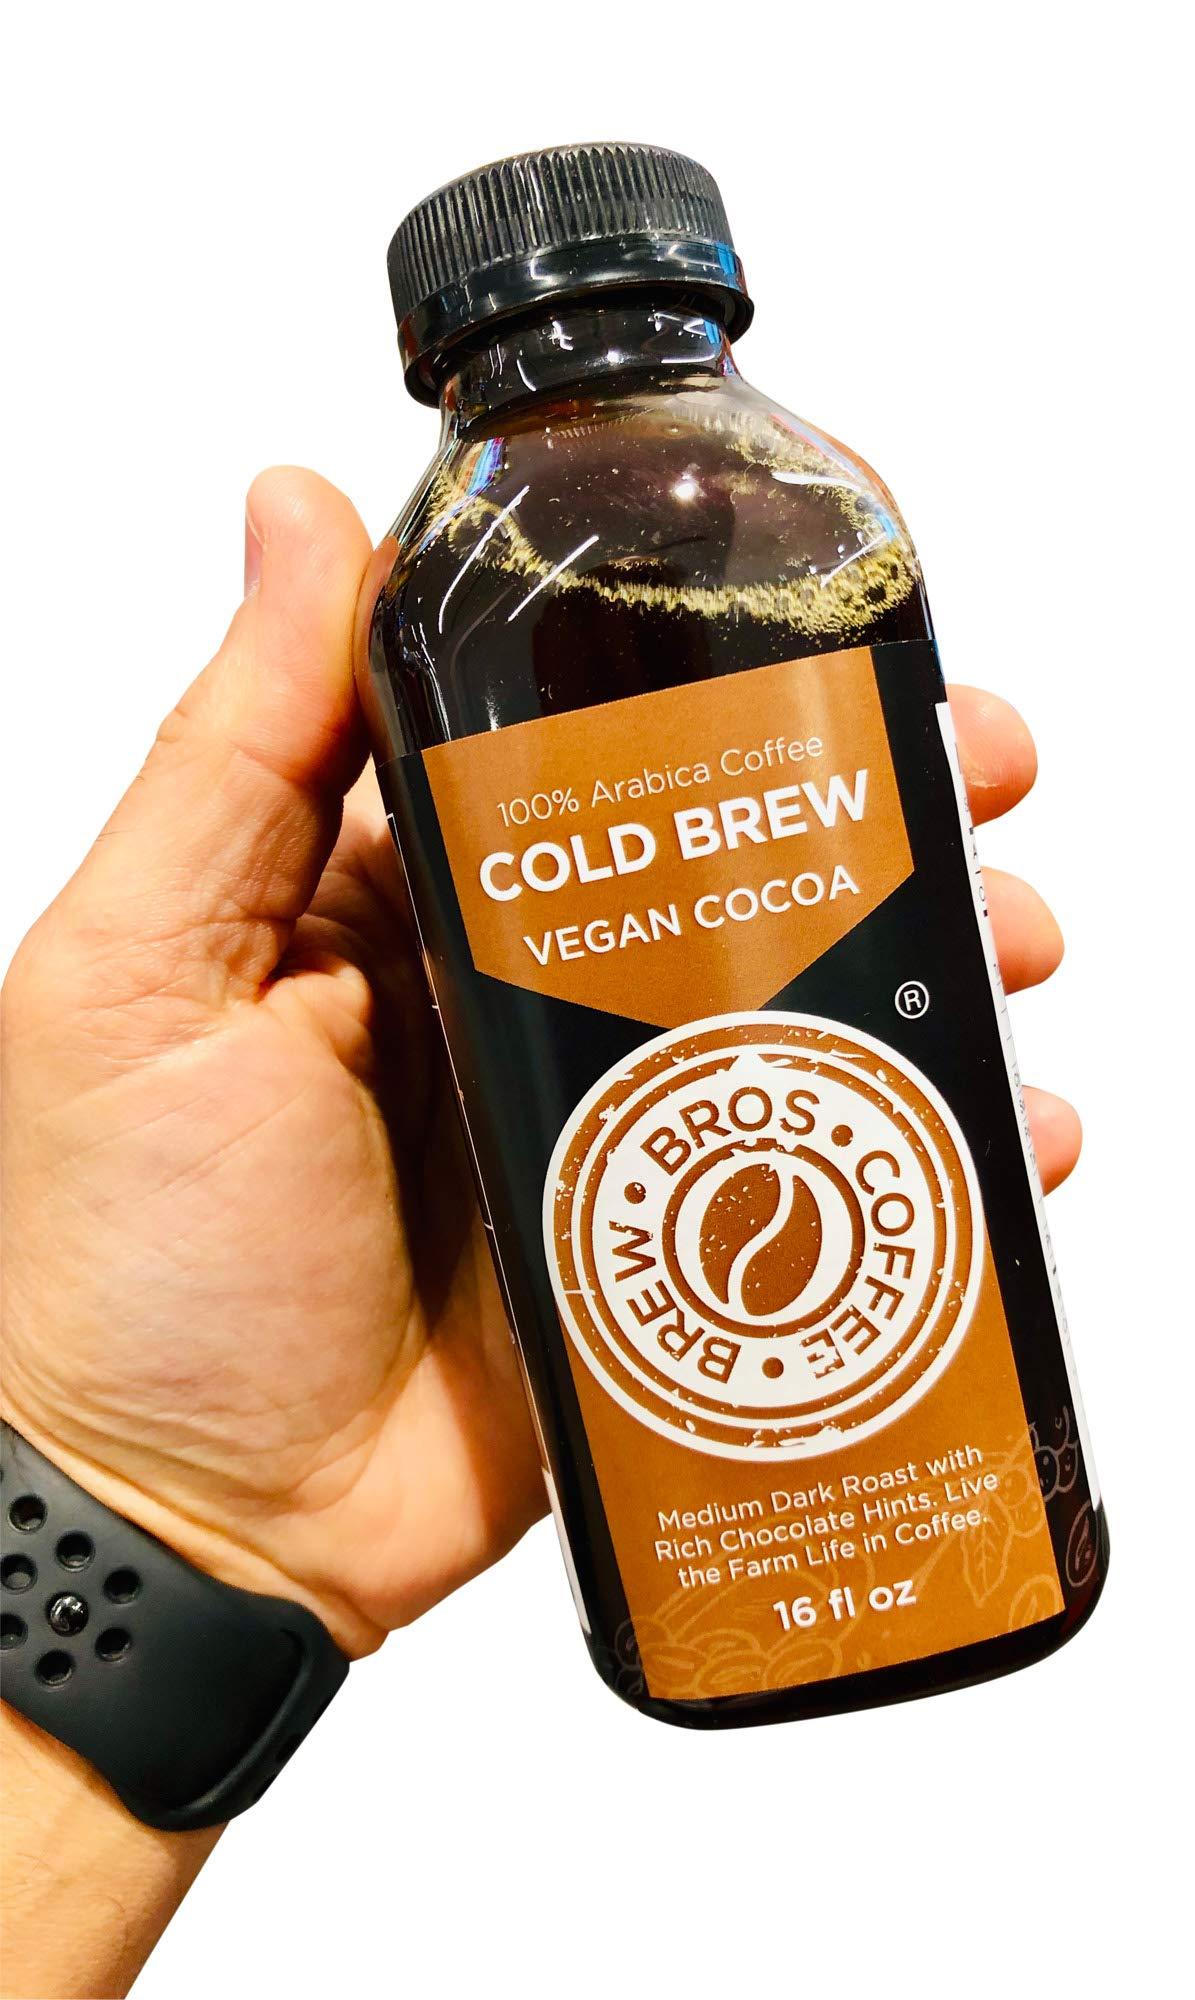 Artisan Small Batch Roasted 16 hour Brew Vegan Chocolate COLD Brew Bros - 8 pack (16oz) Medium Dark Roast